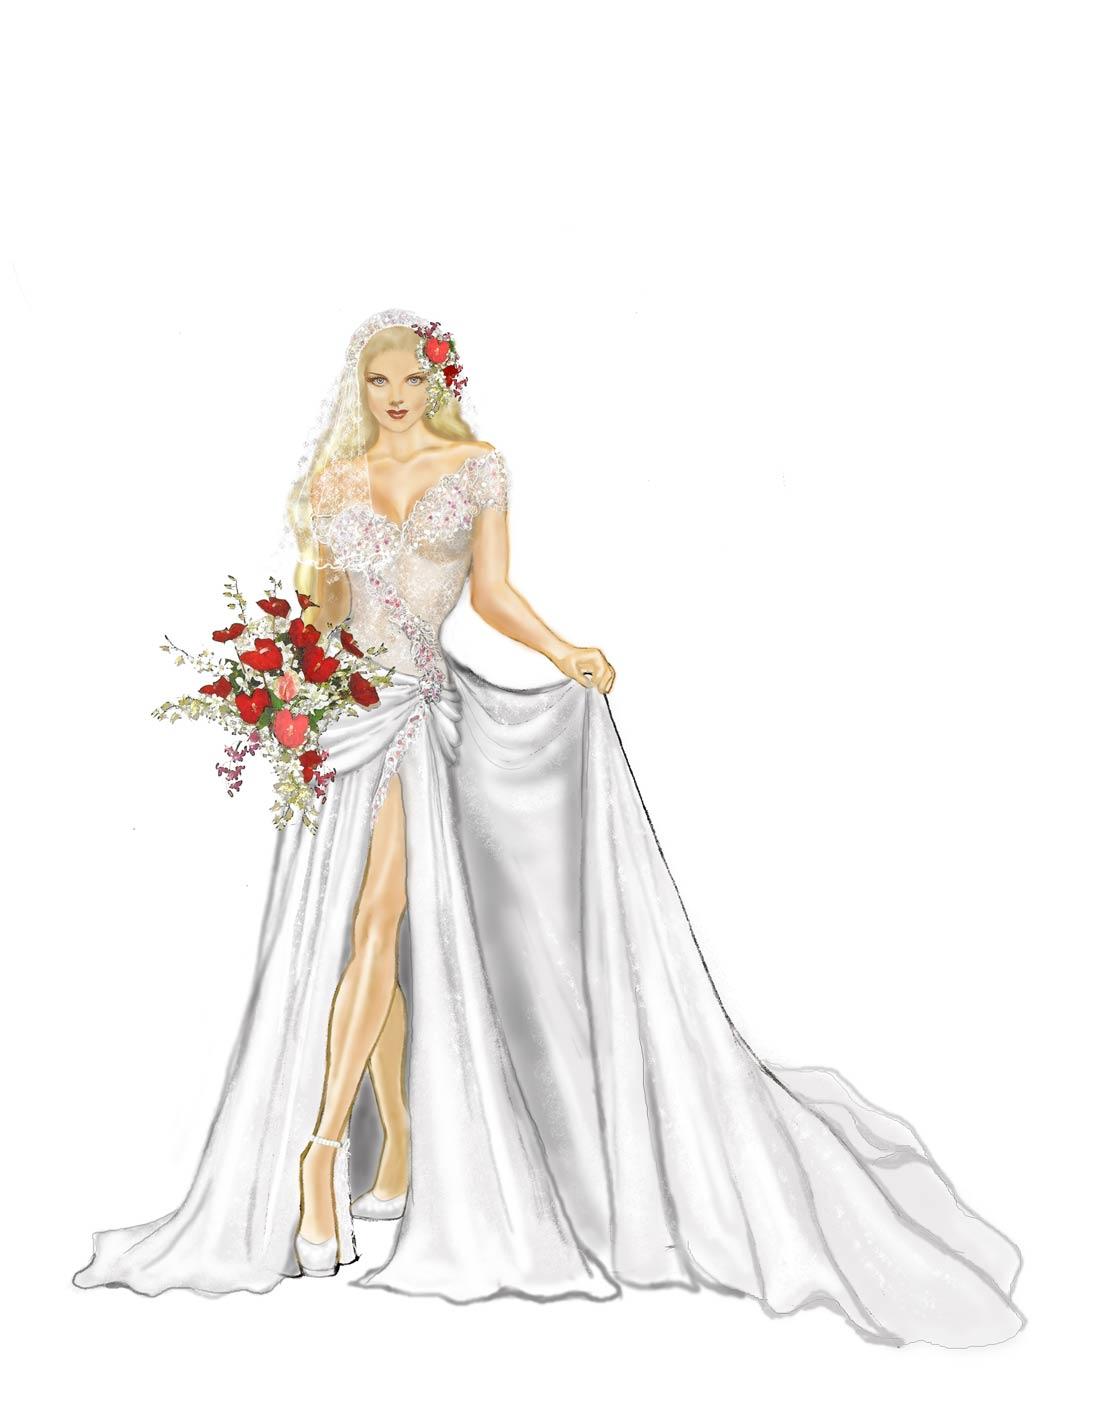 Tropical bride 3 Cindy McClure